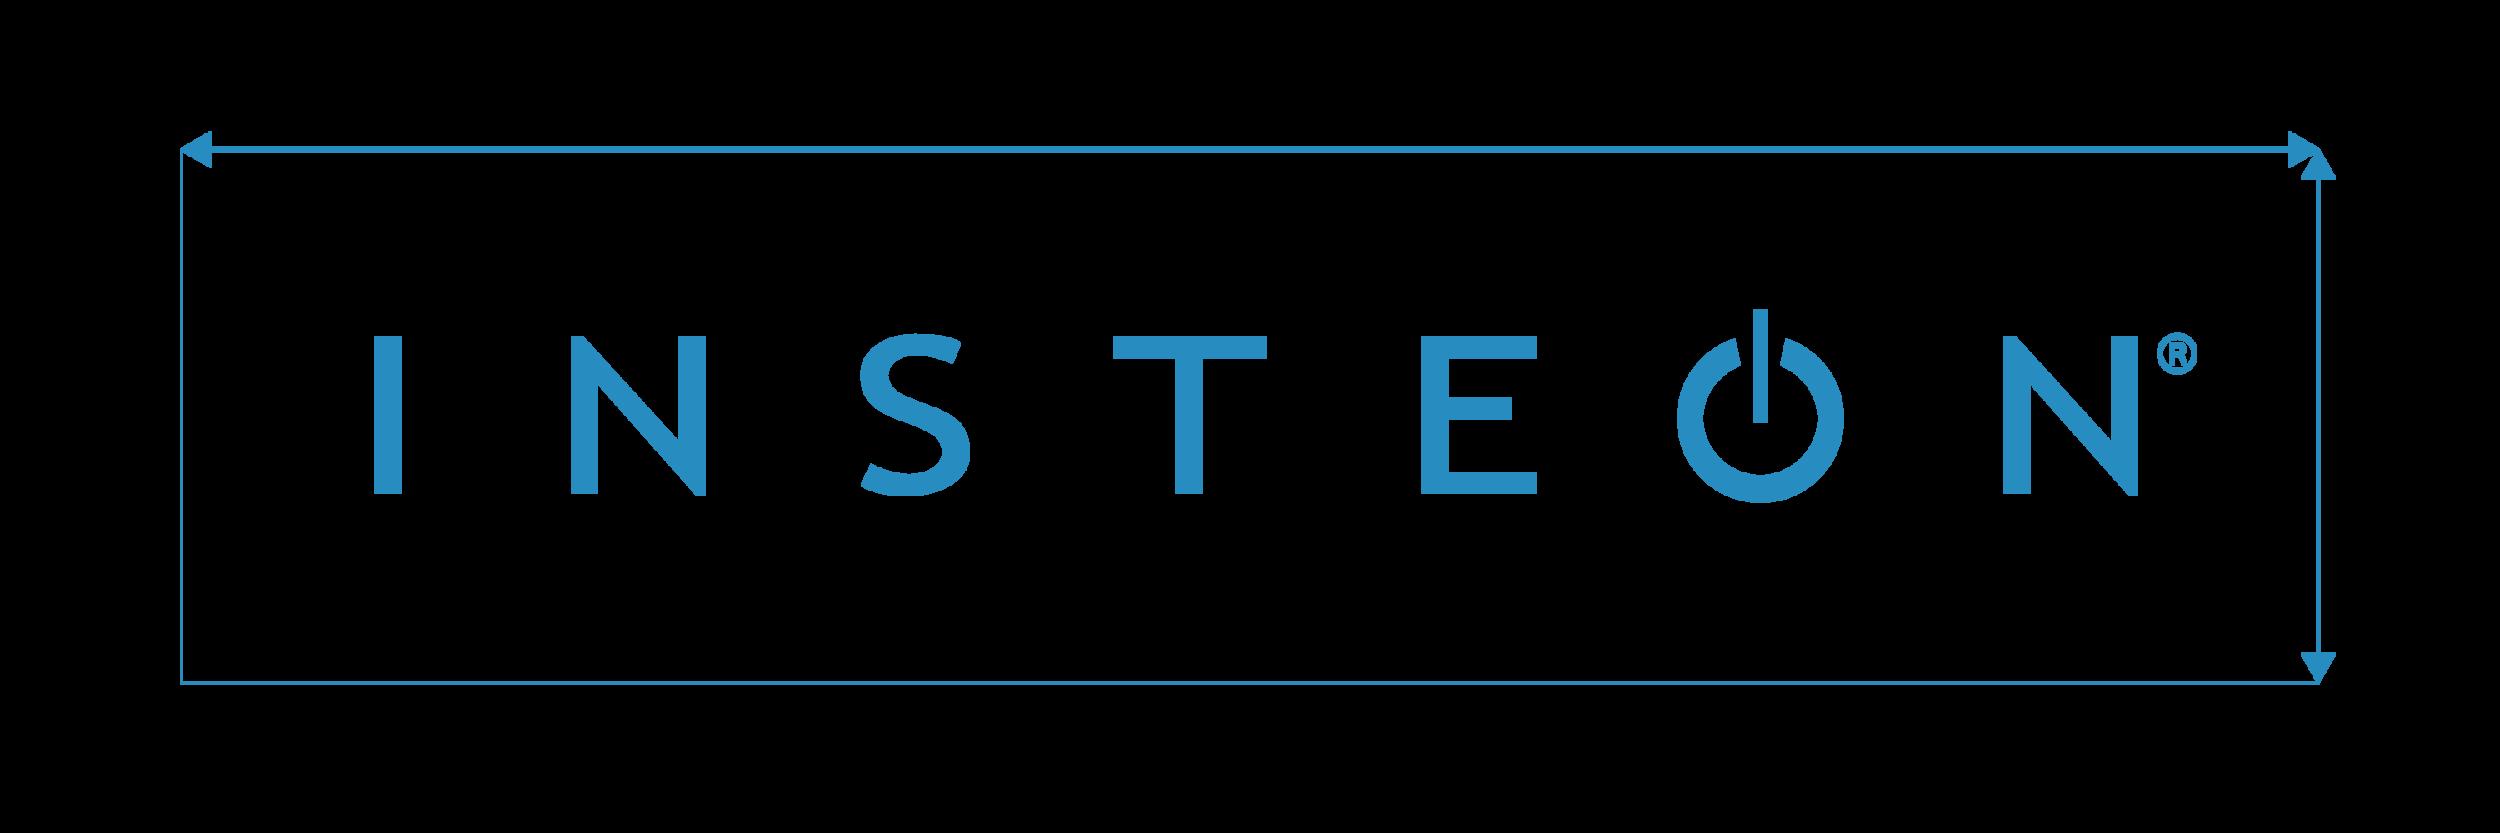 logo minimum size.png